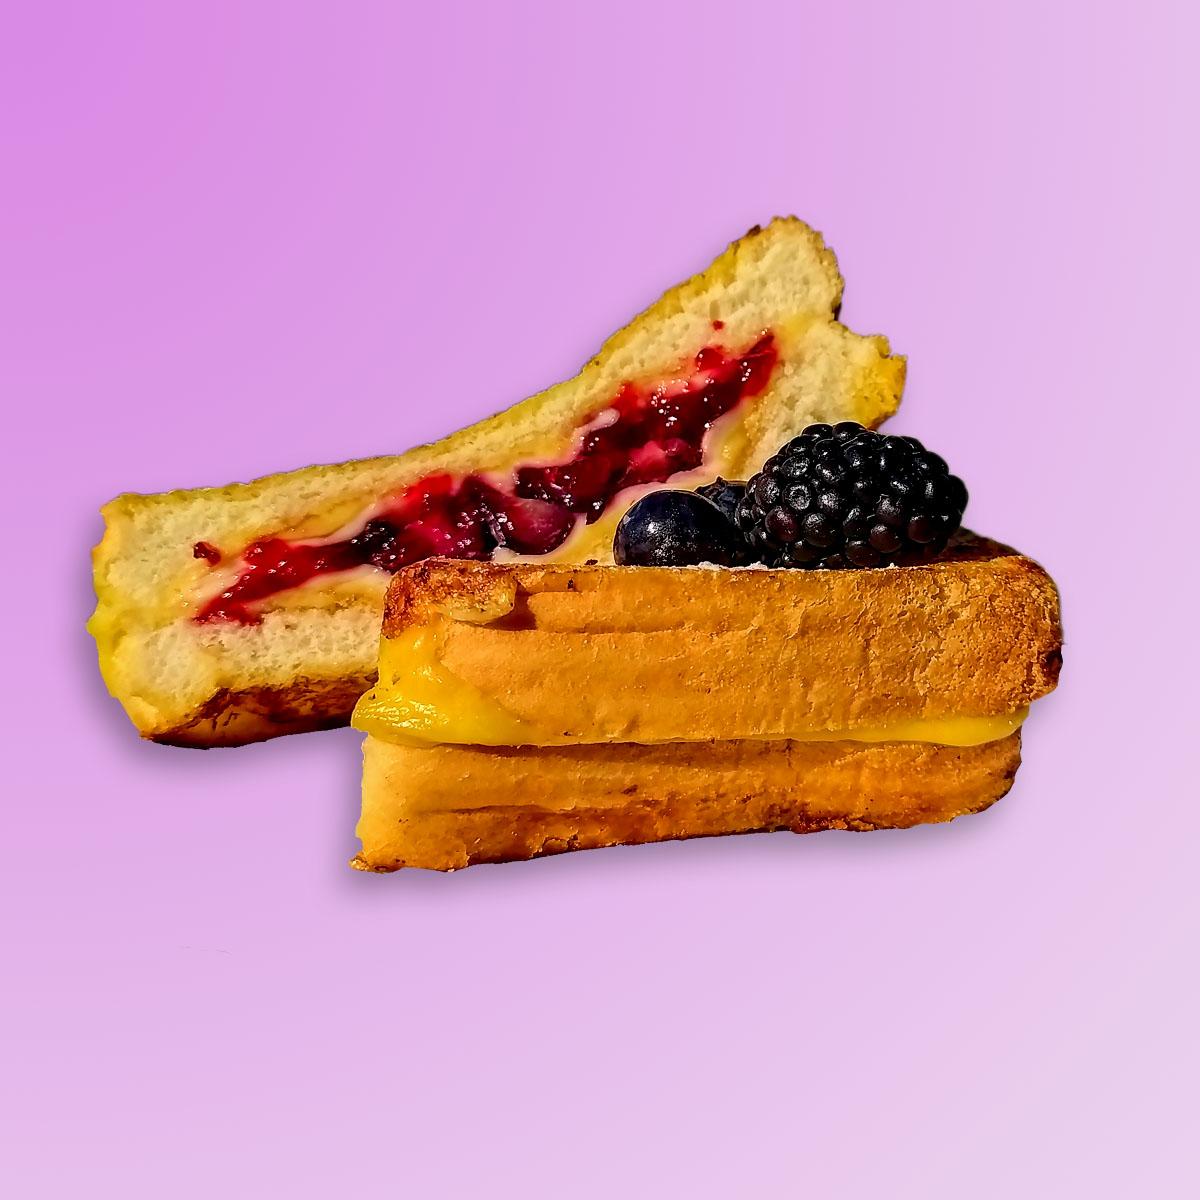 Happyblueberry sandwich